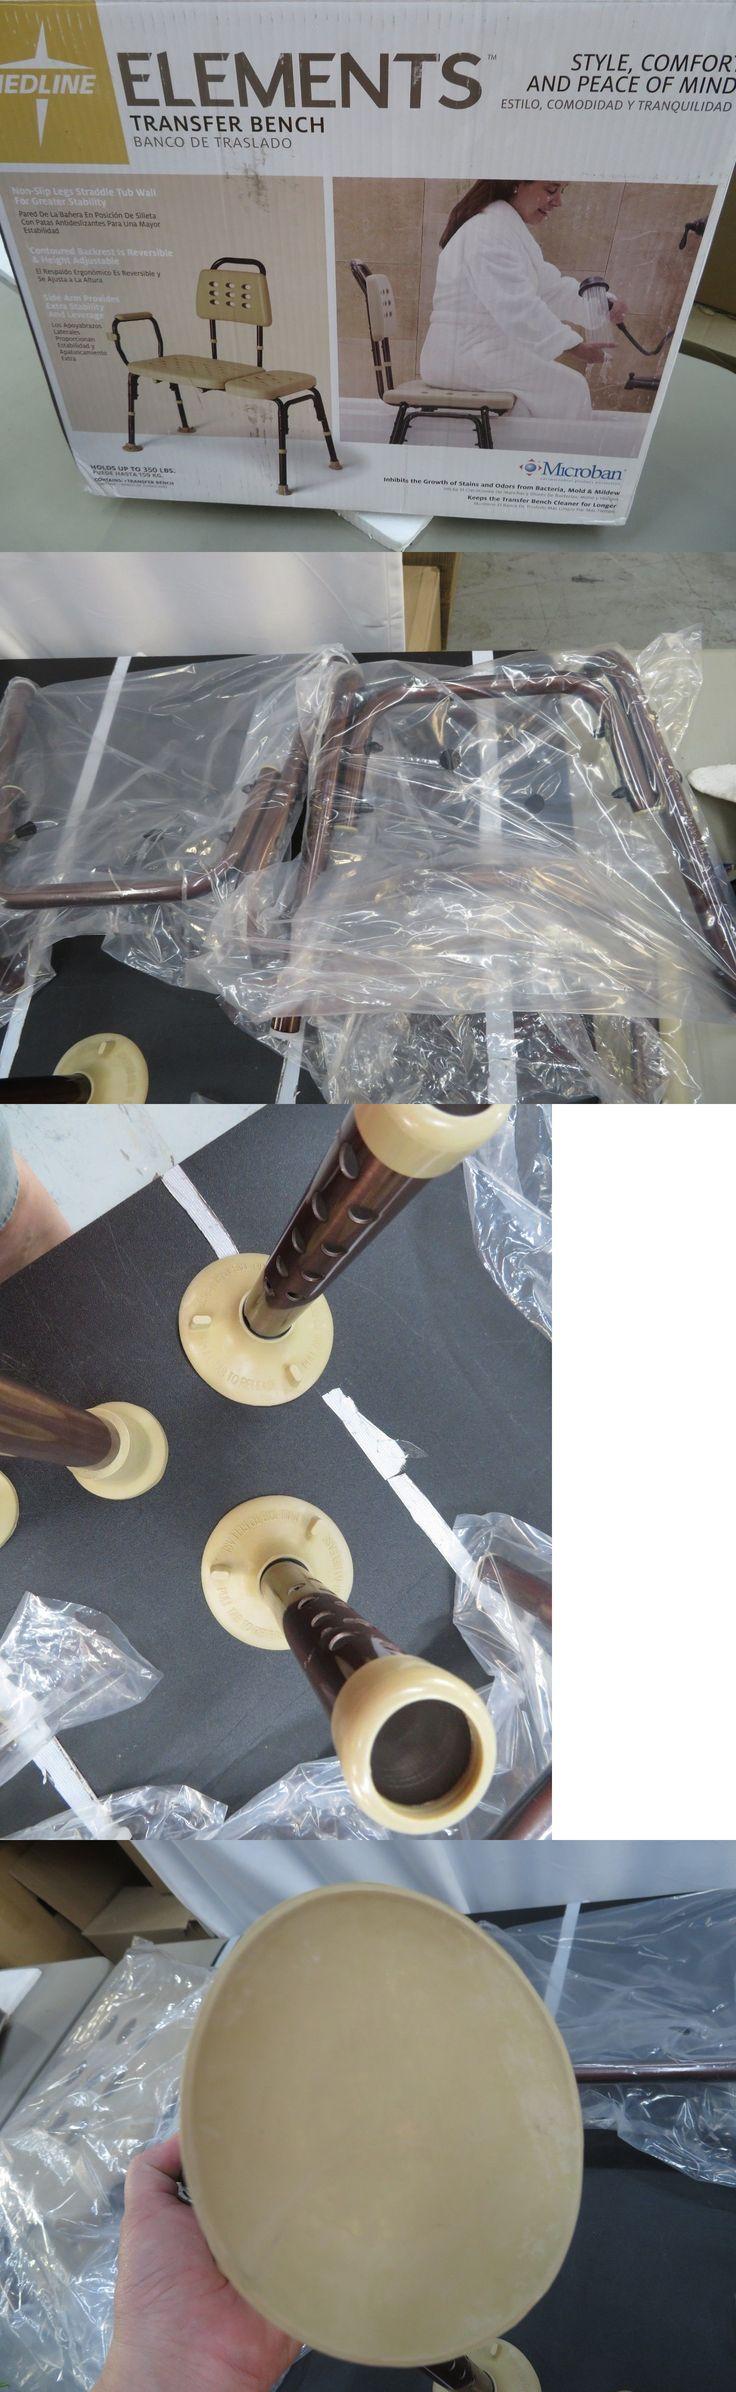 Best 25 Transfer Bench Ideas On Pinterest Wood Burning